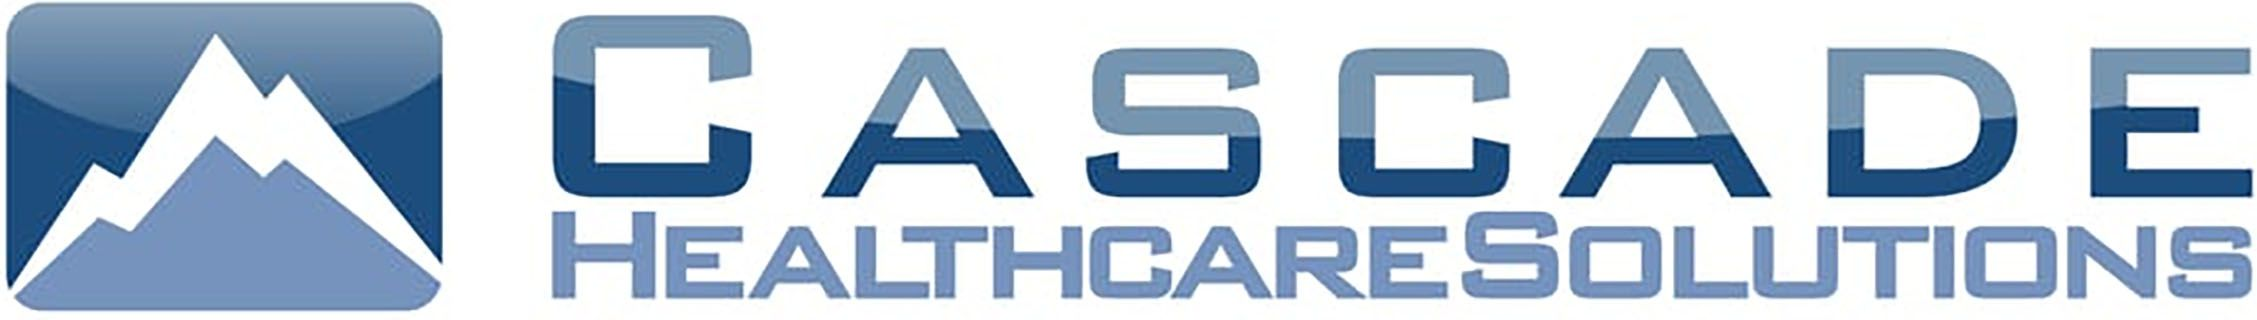 Cascade Healthcare Solutions